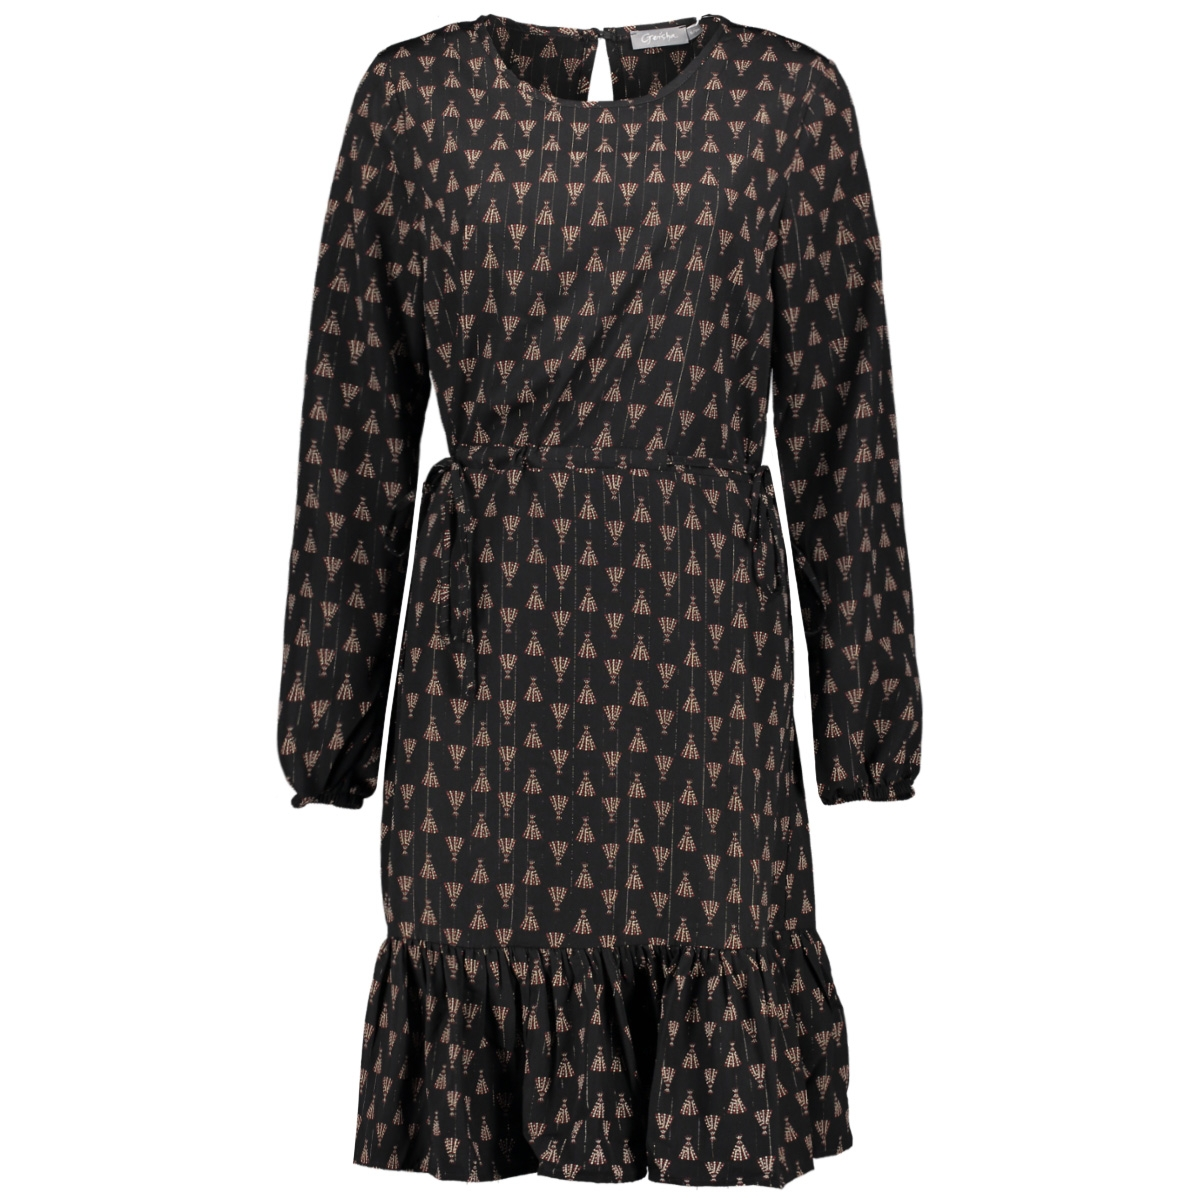 dress 07644 20 geisha jurk black/red combi